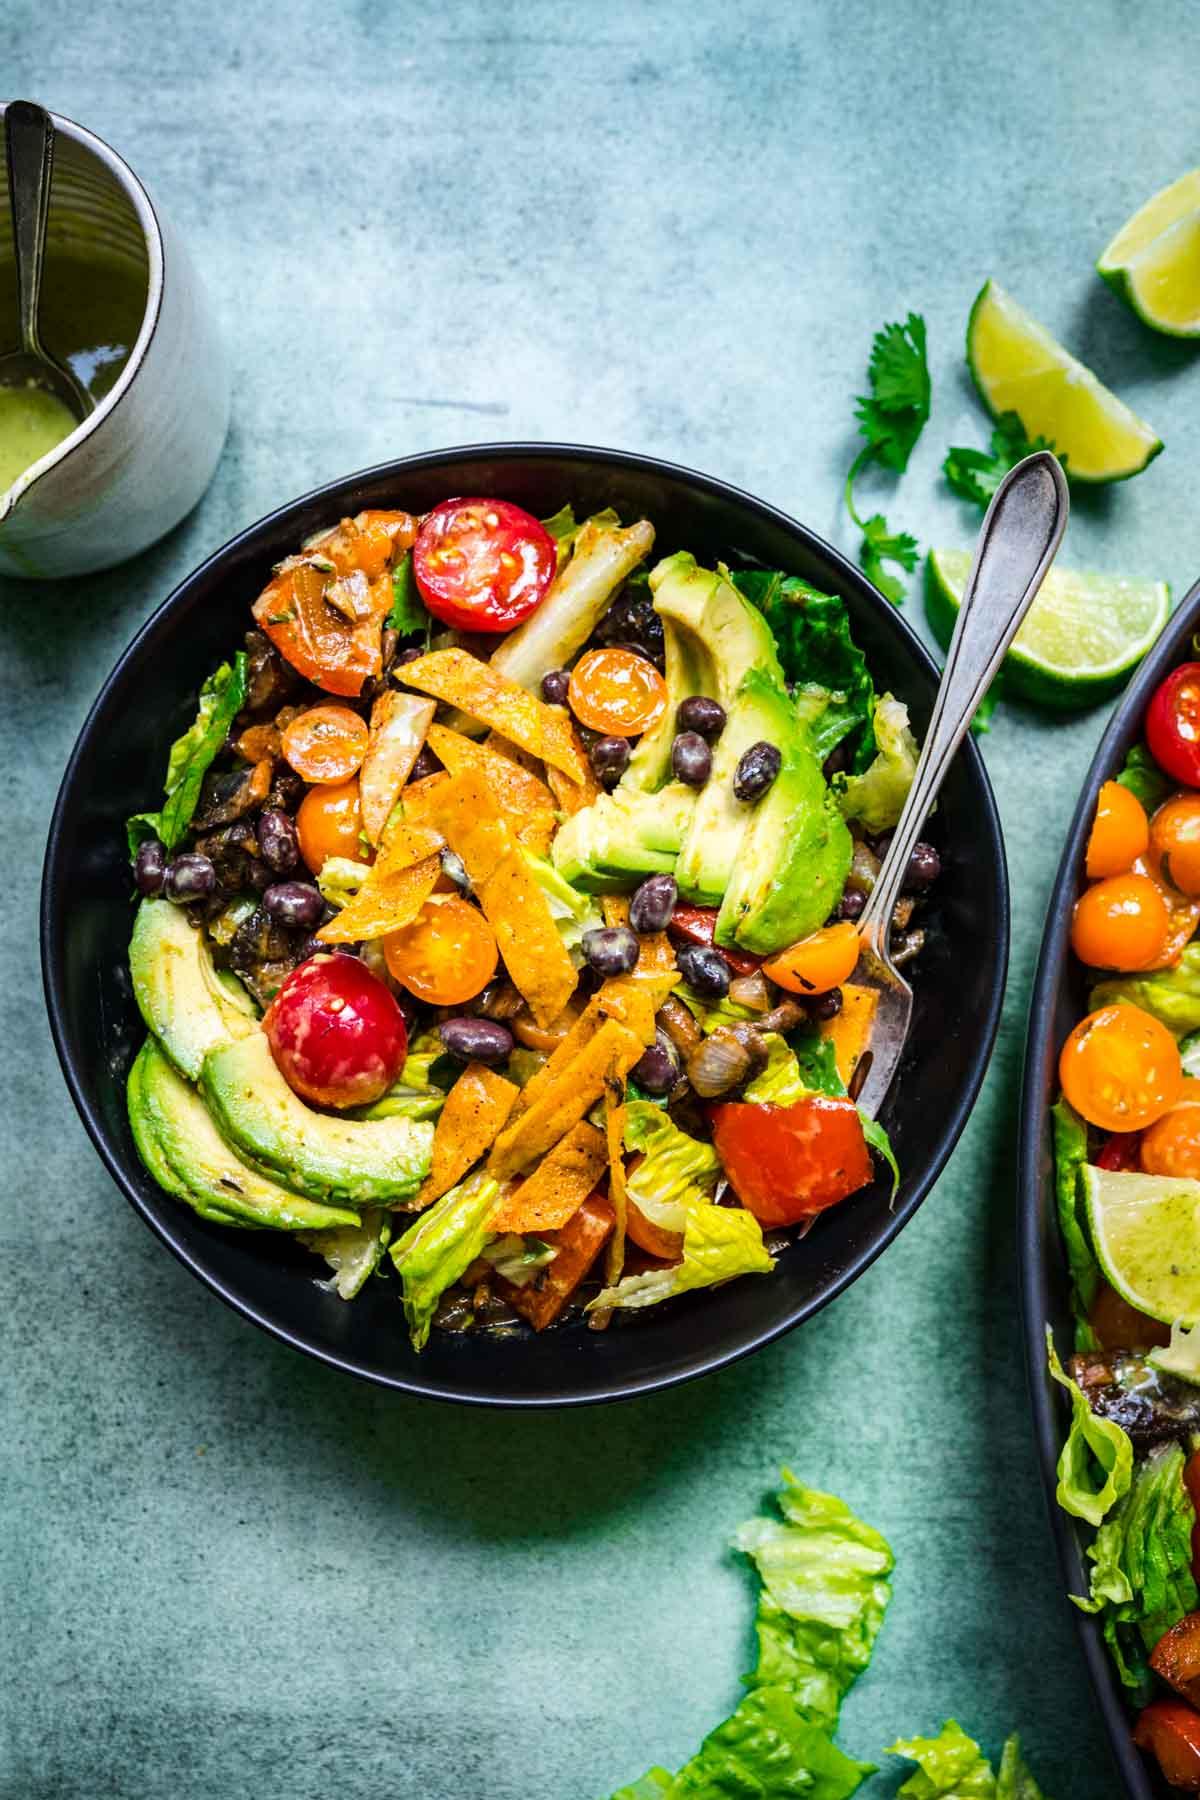 overhead view of fajita vegetable salad in small black bowl.